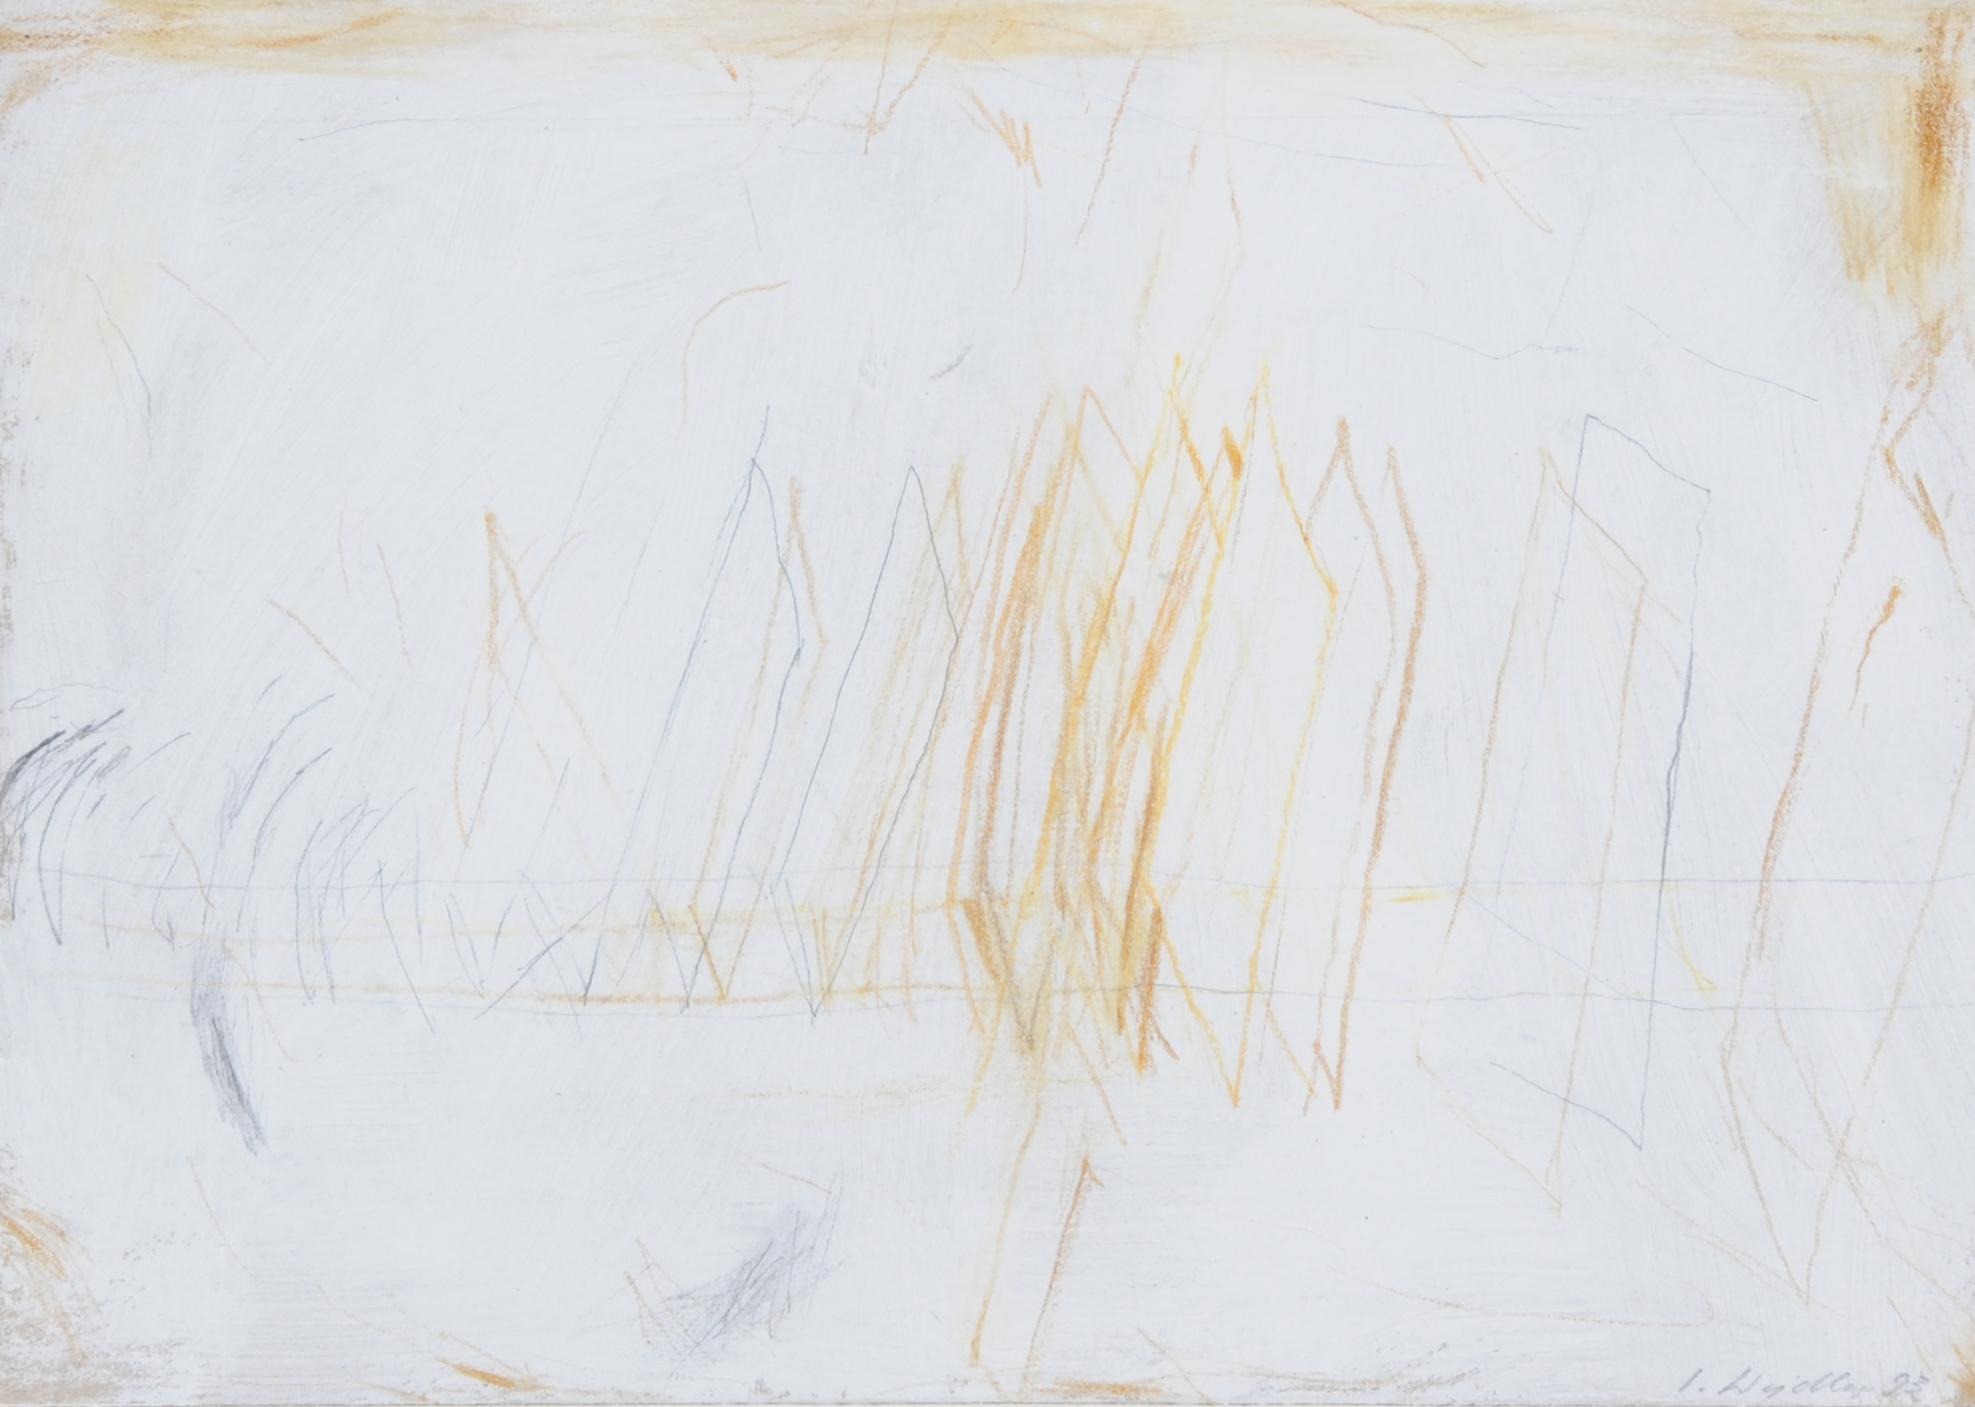 Wydler Irene, Untitled